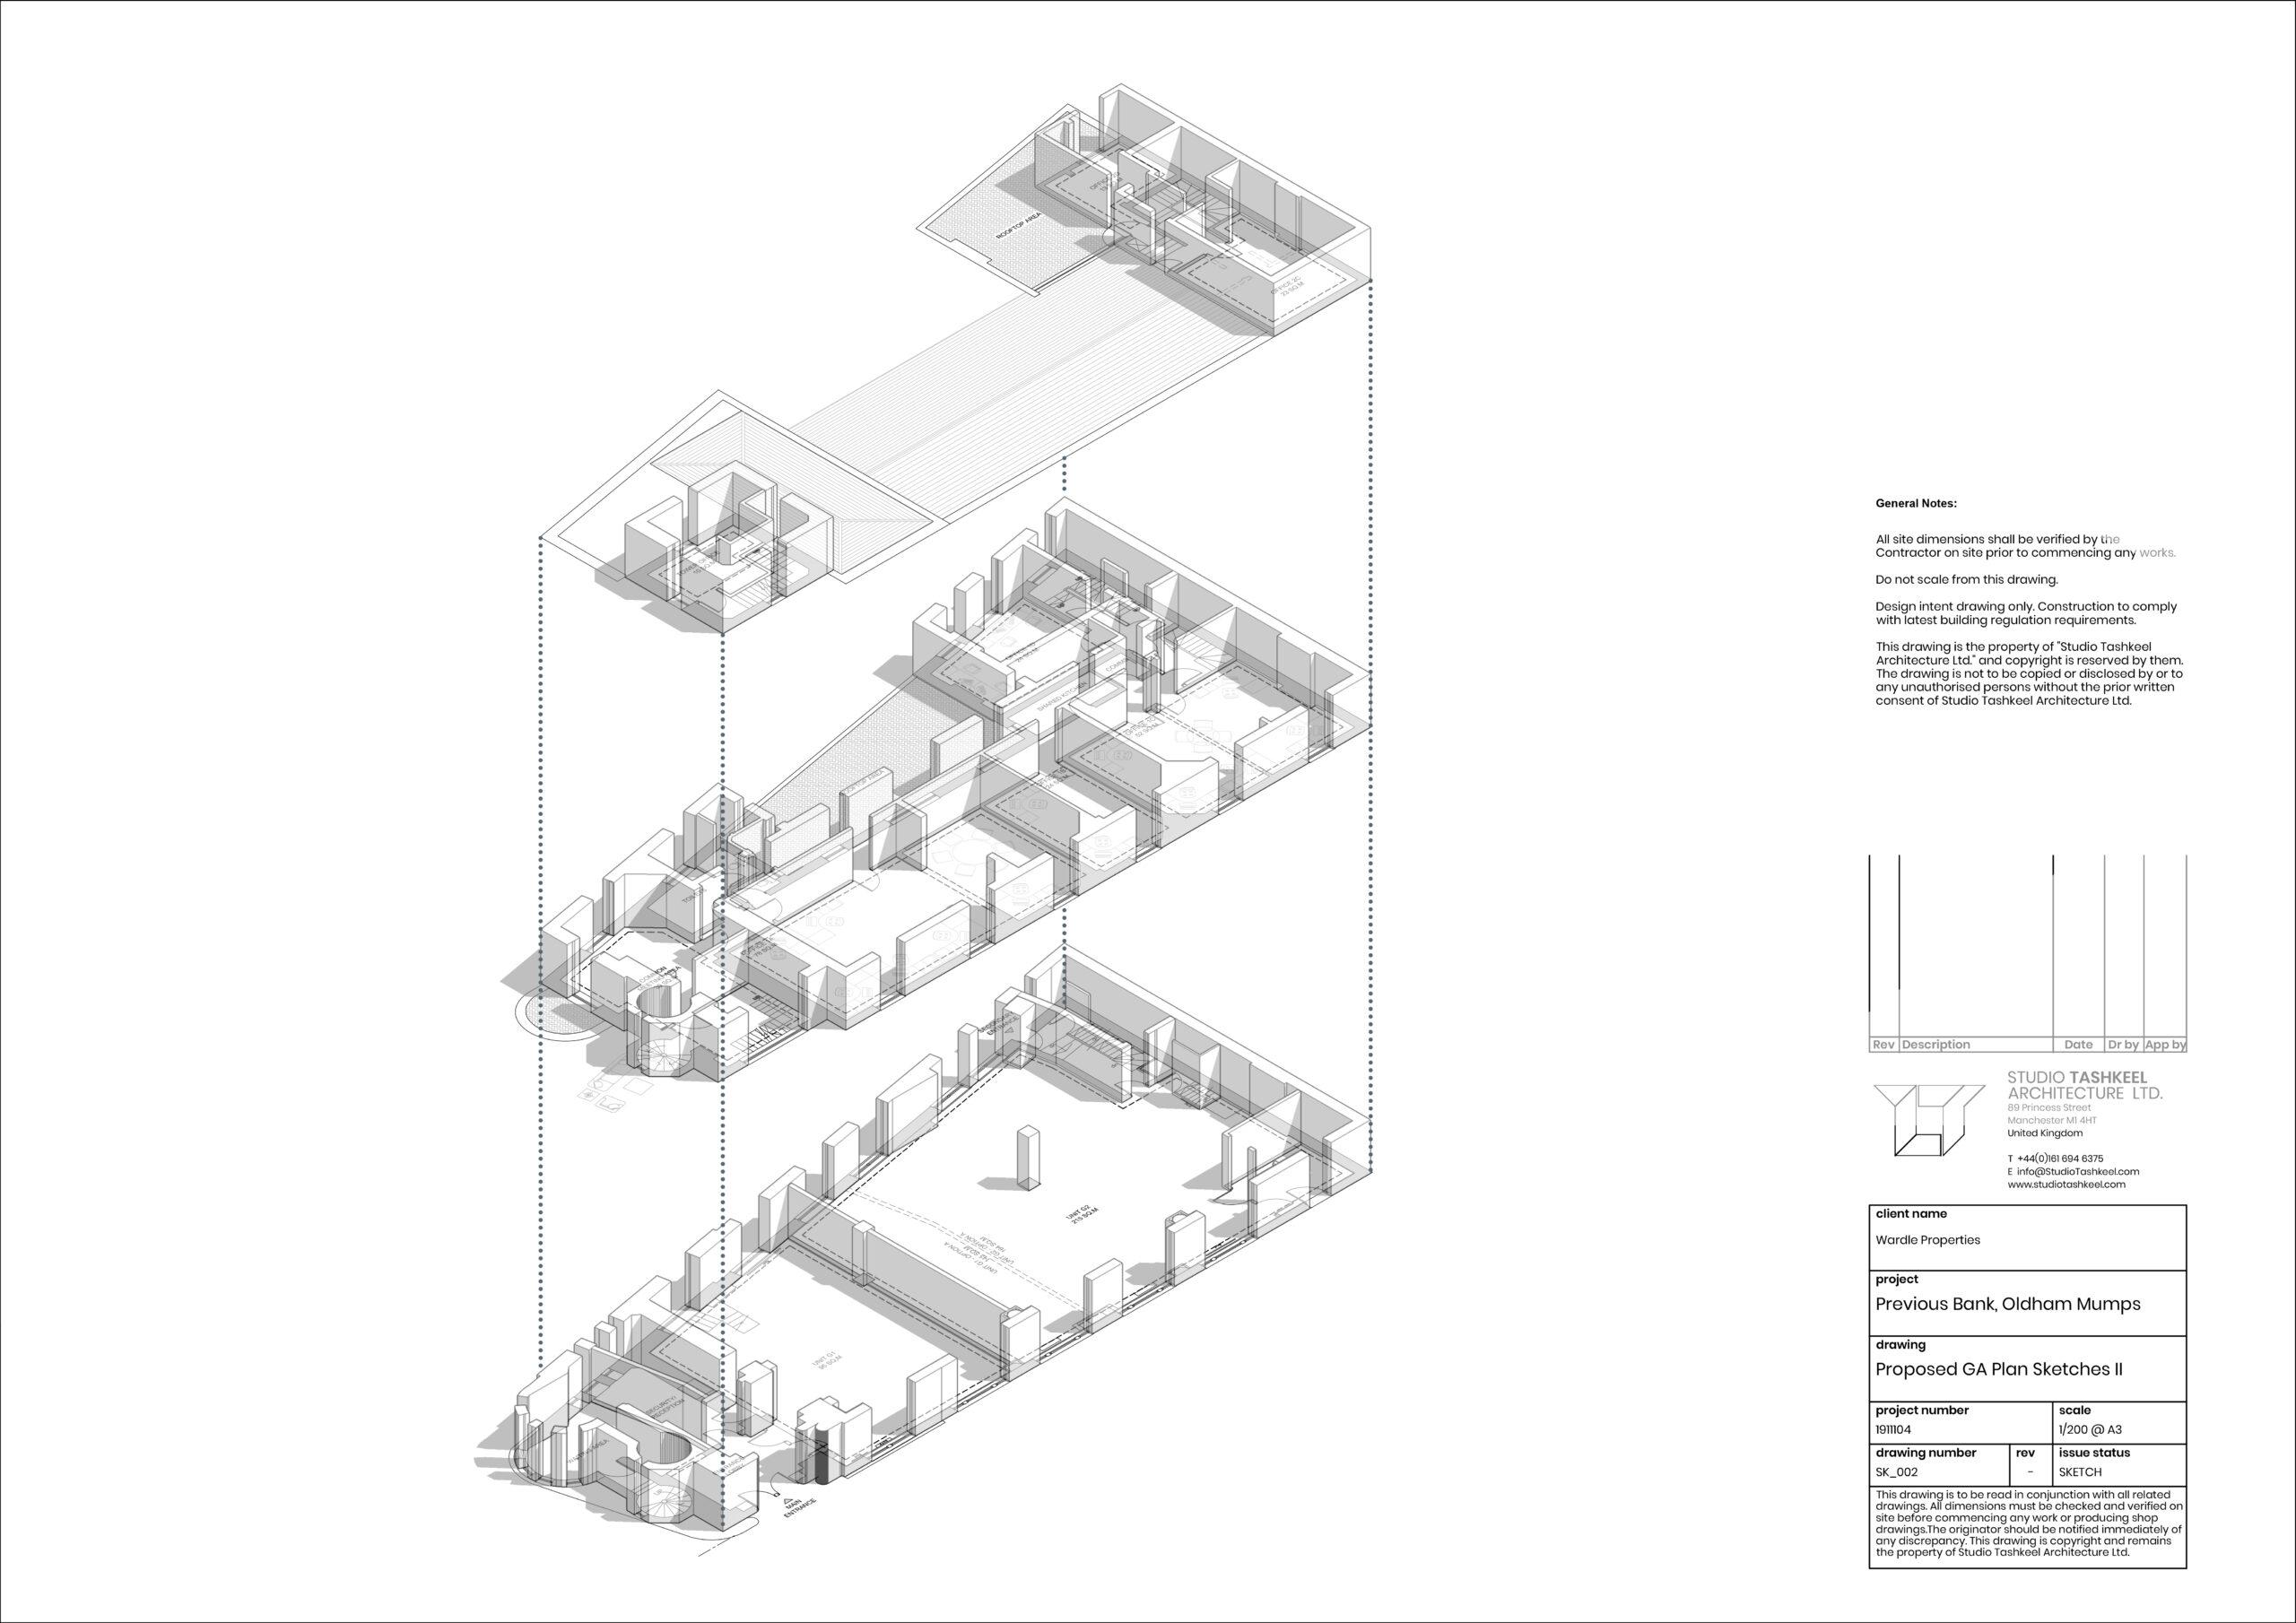 Prop GA Plan Sketches II (2)